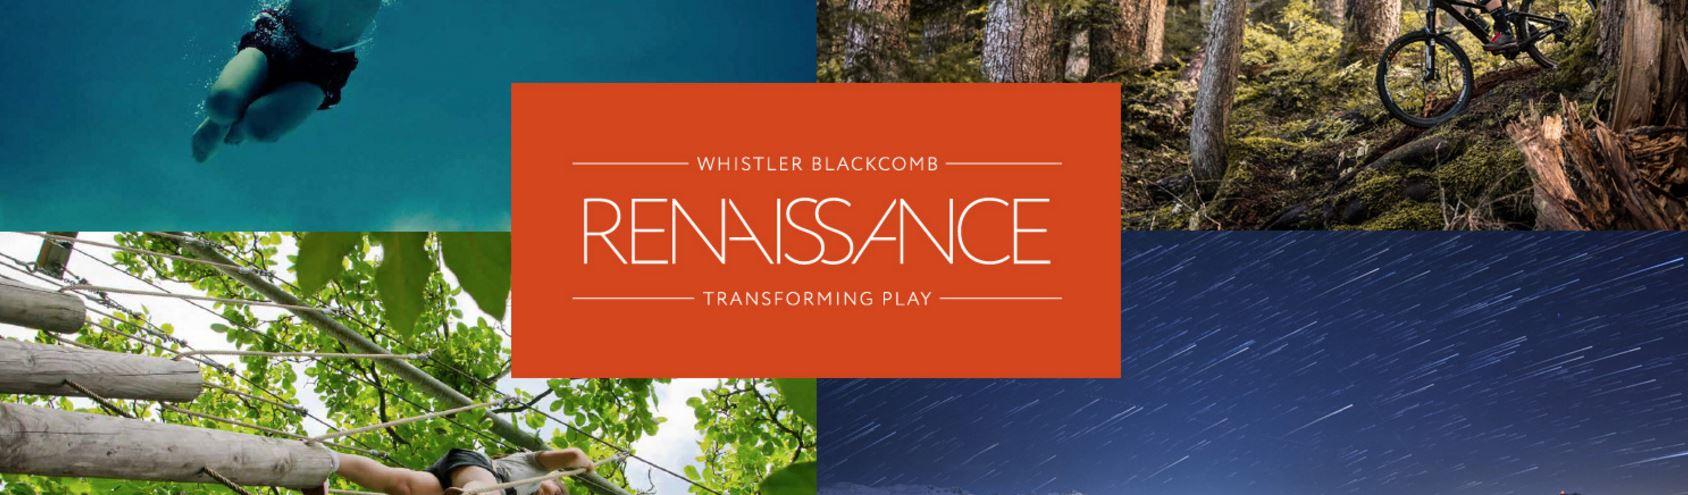 Proyecto Renaissance de Whistler Blackcomb invertirá $345 milliones